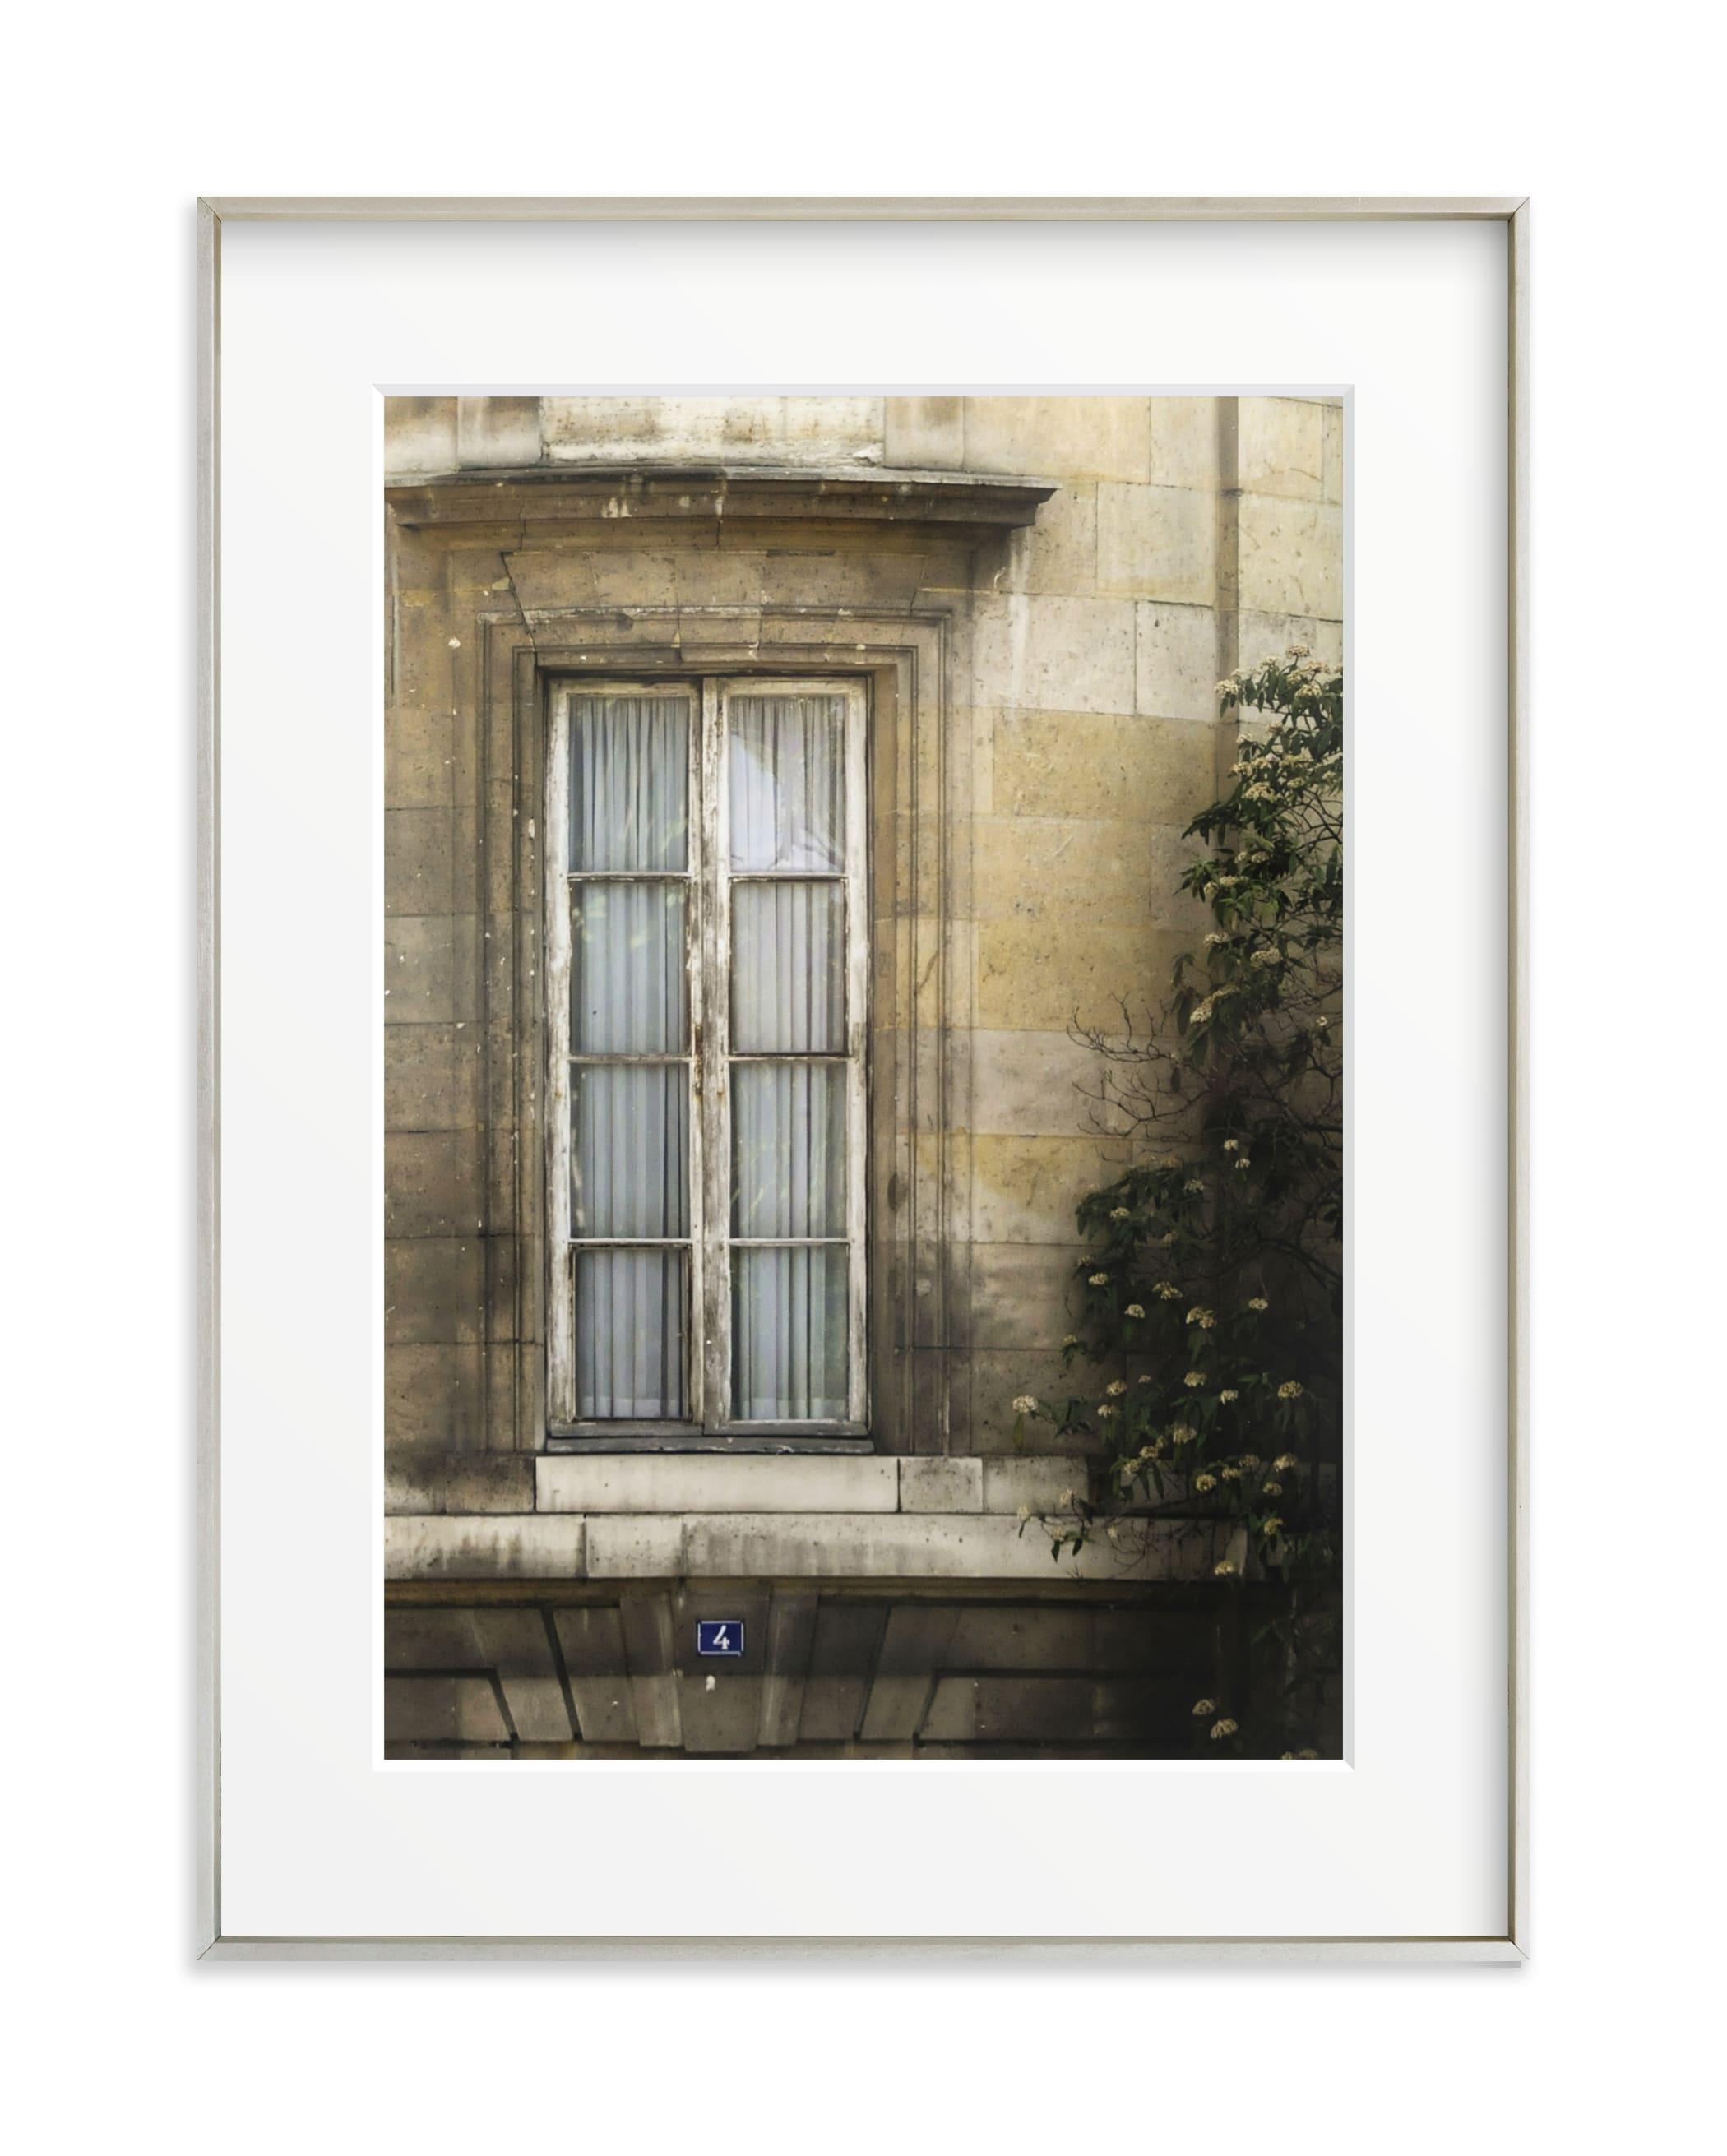 Saint Germain Window Art Print